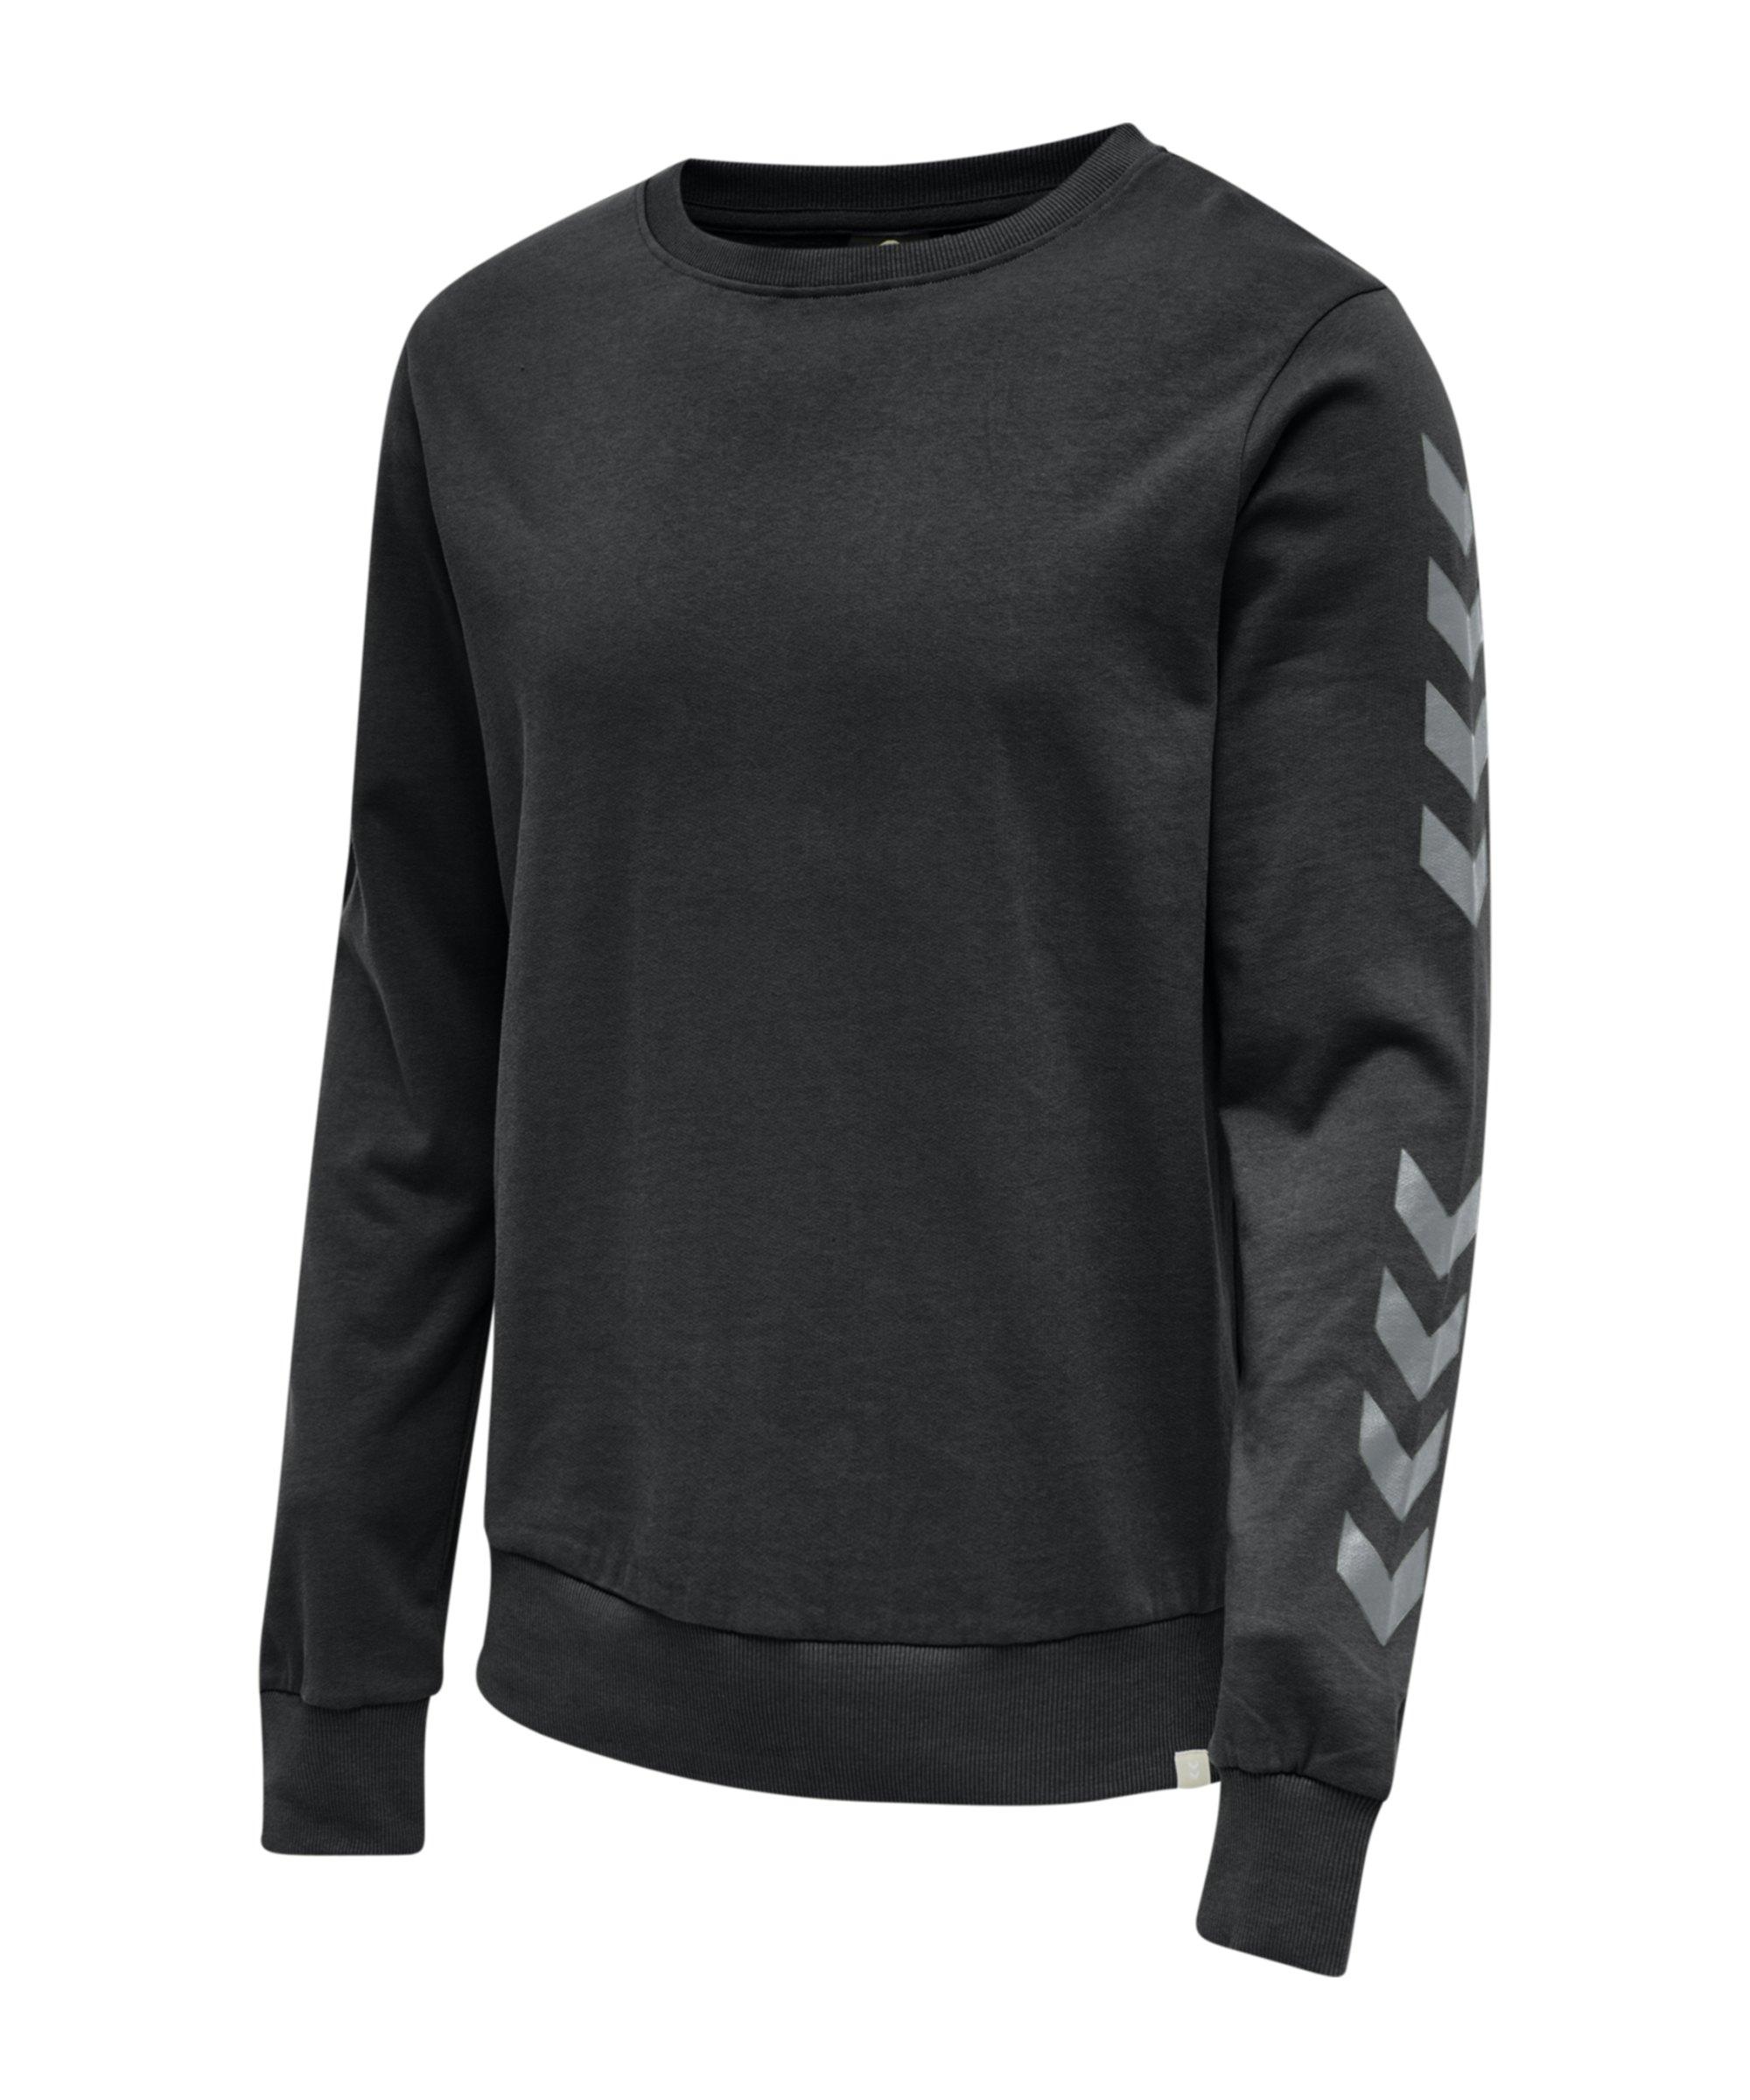 Hummel Legacy Chevron Sweatshirt Schwarz F2001 - schwarz